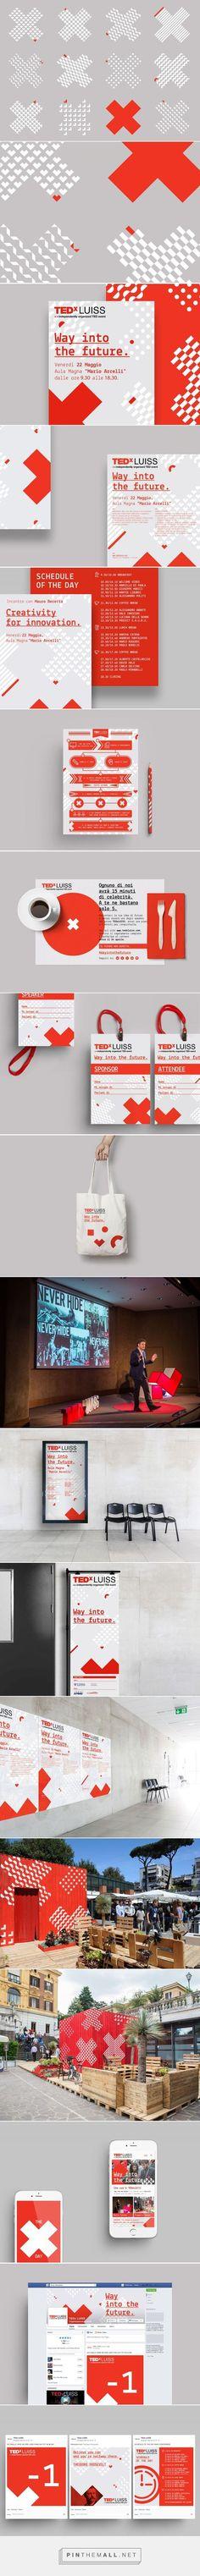 TEDxLUISS: